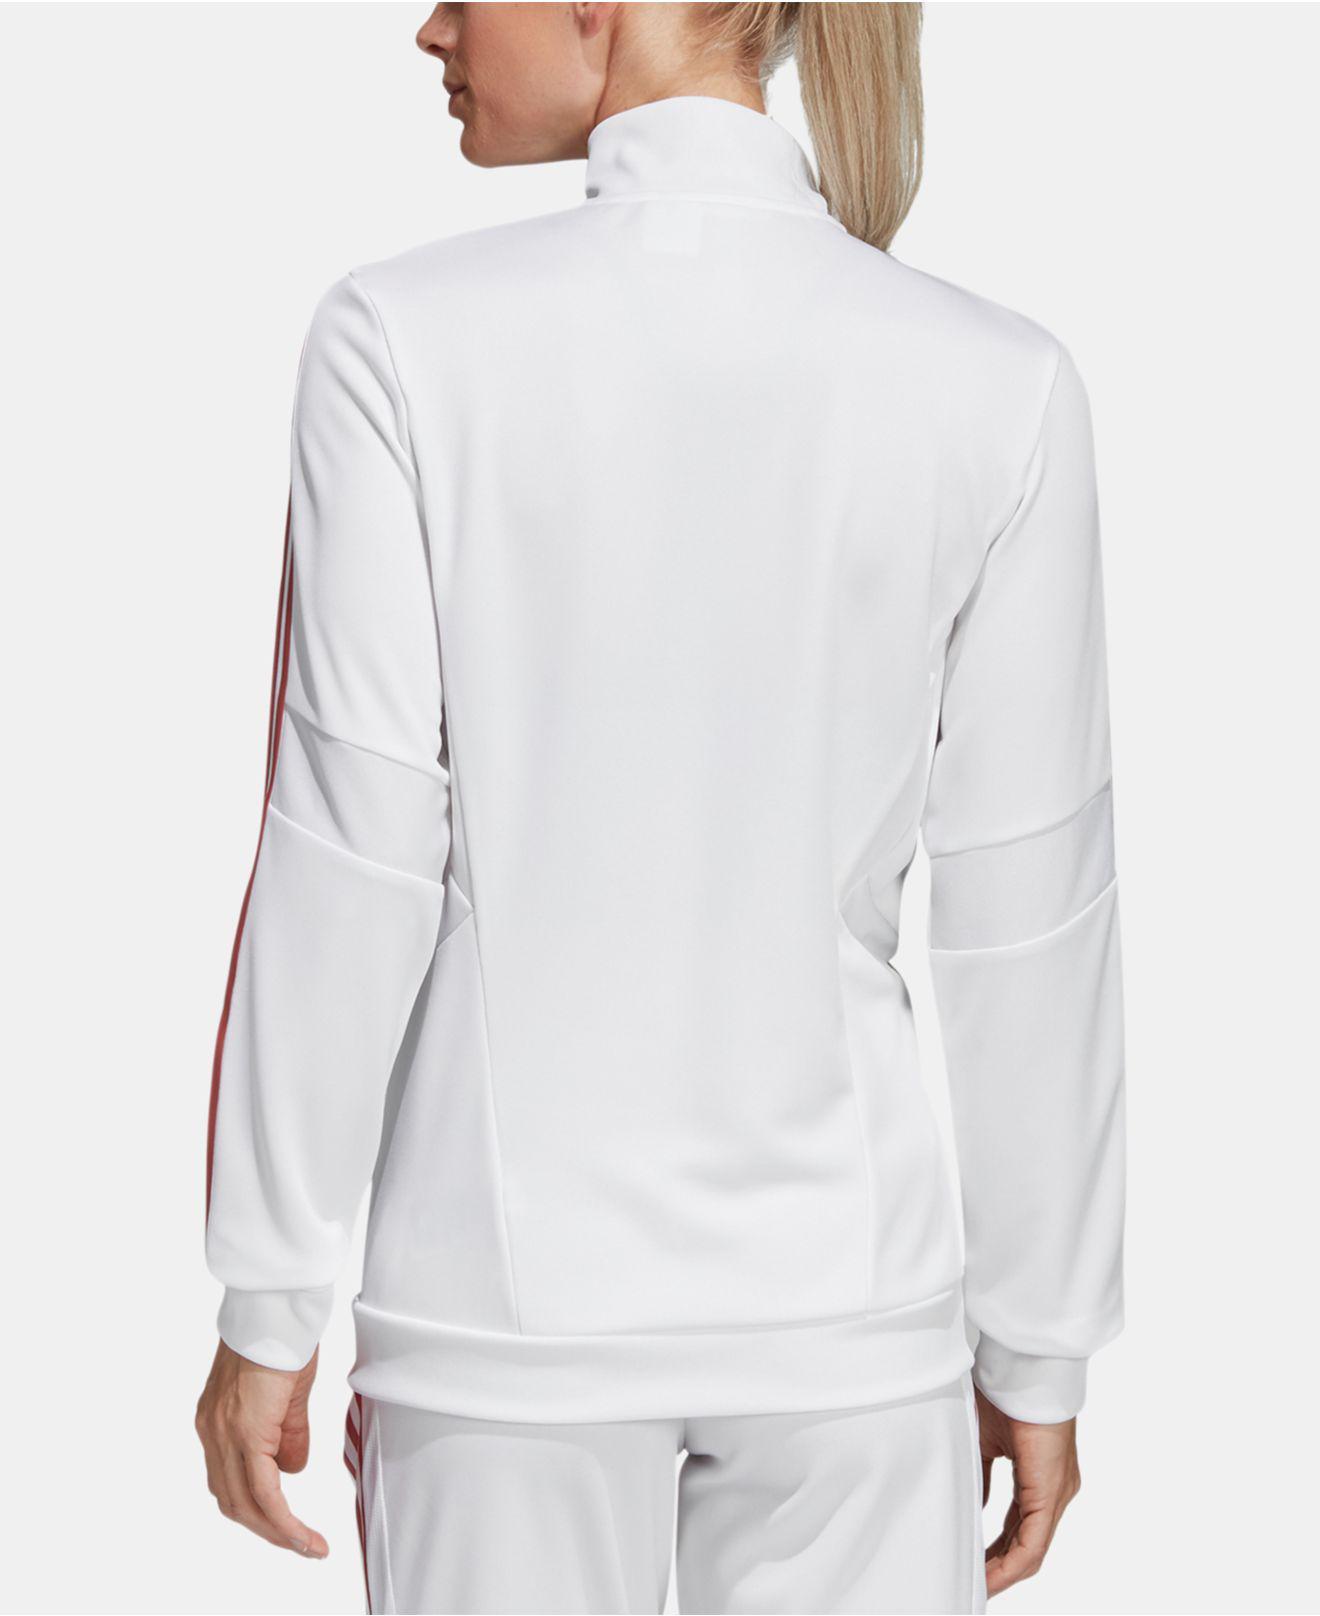 910ec09b0 adidas Pearl Essence Tiro Track Jacket in White - Lyst